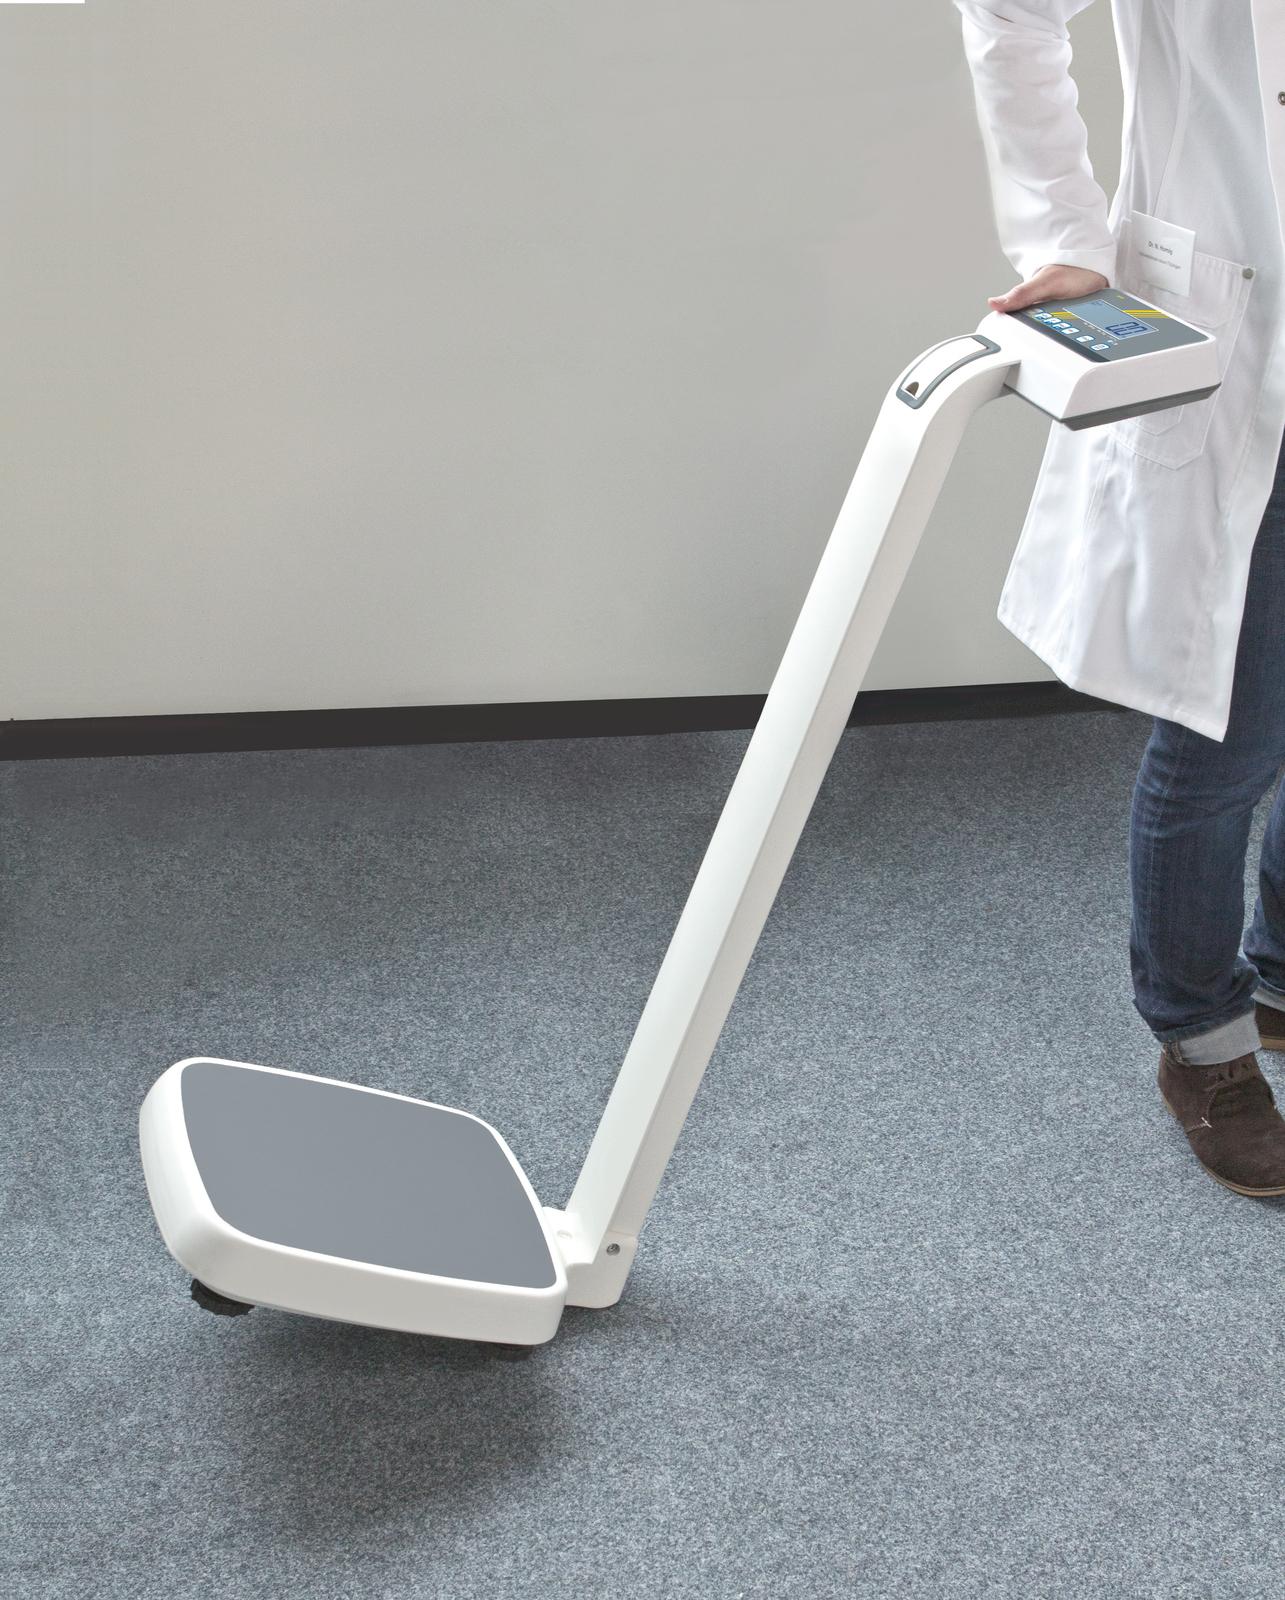 personenwaage mpe bis 250 kg mit bmi funktion. Black Bedroom Furniture Sets. Home Design Ideas